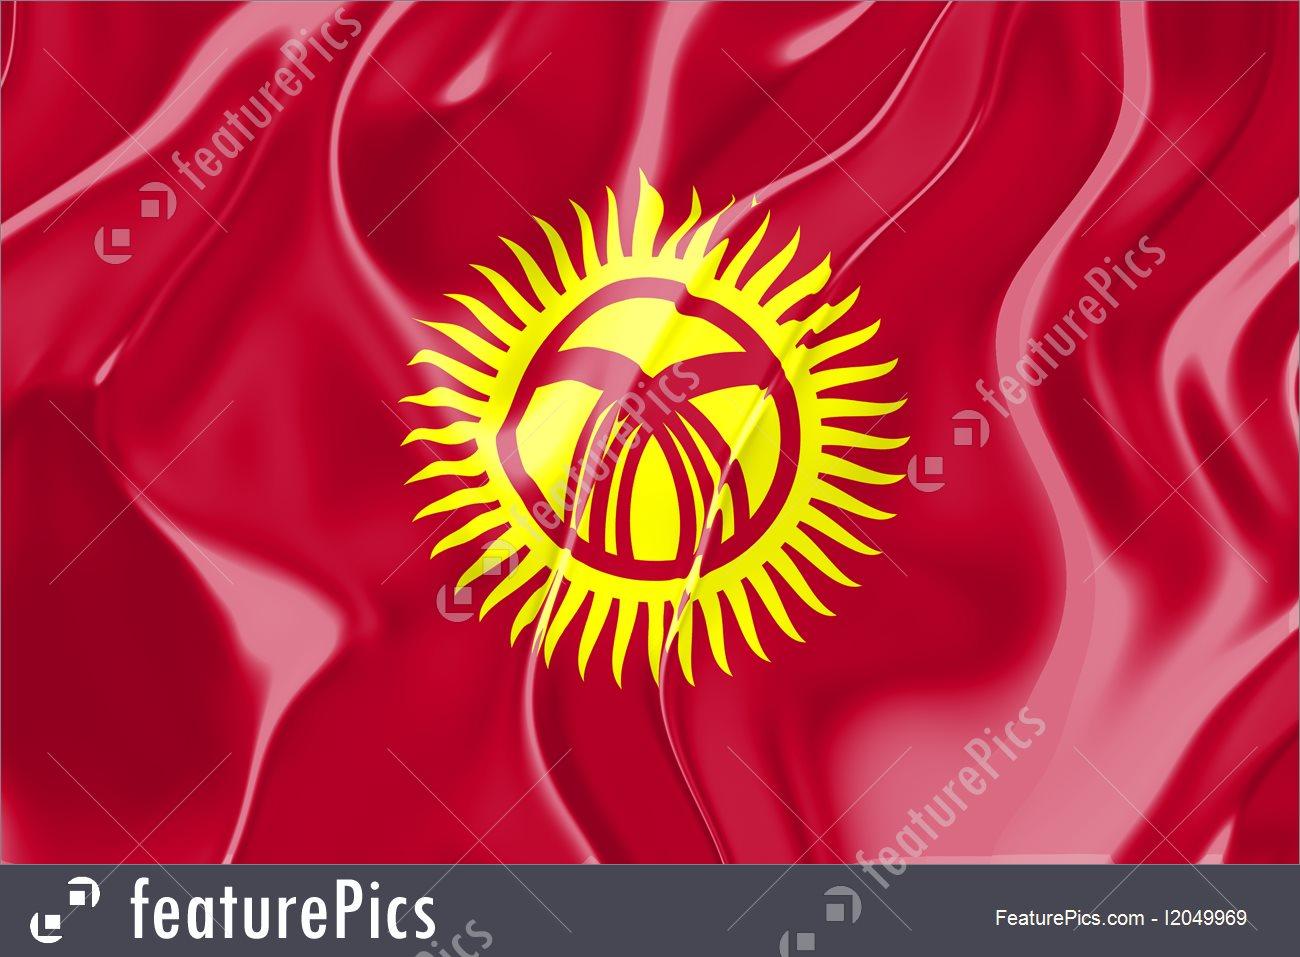 High Resolution Wallpaper   Flag Of Kyrgyzstan 1300x957 px